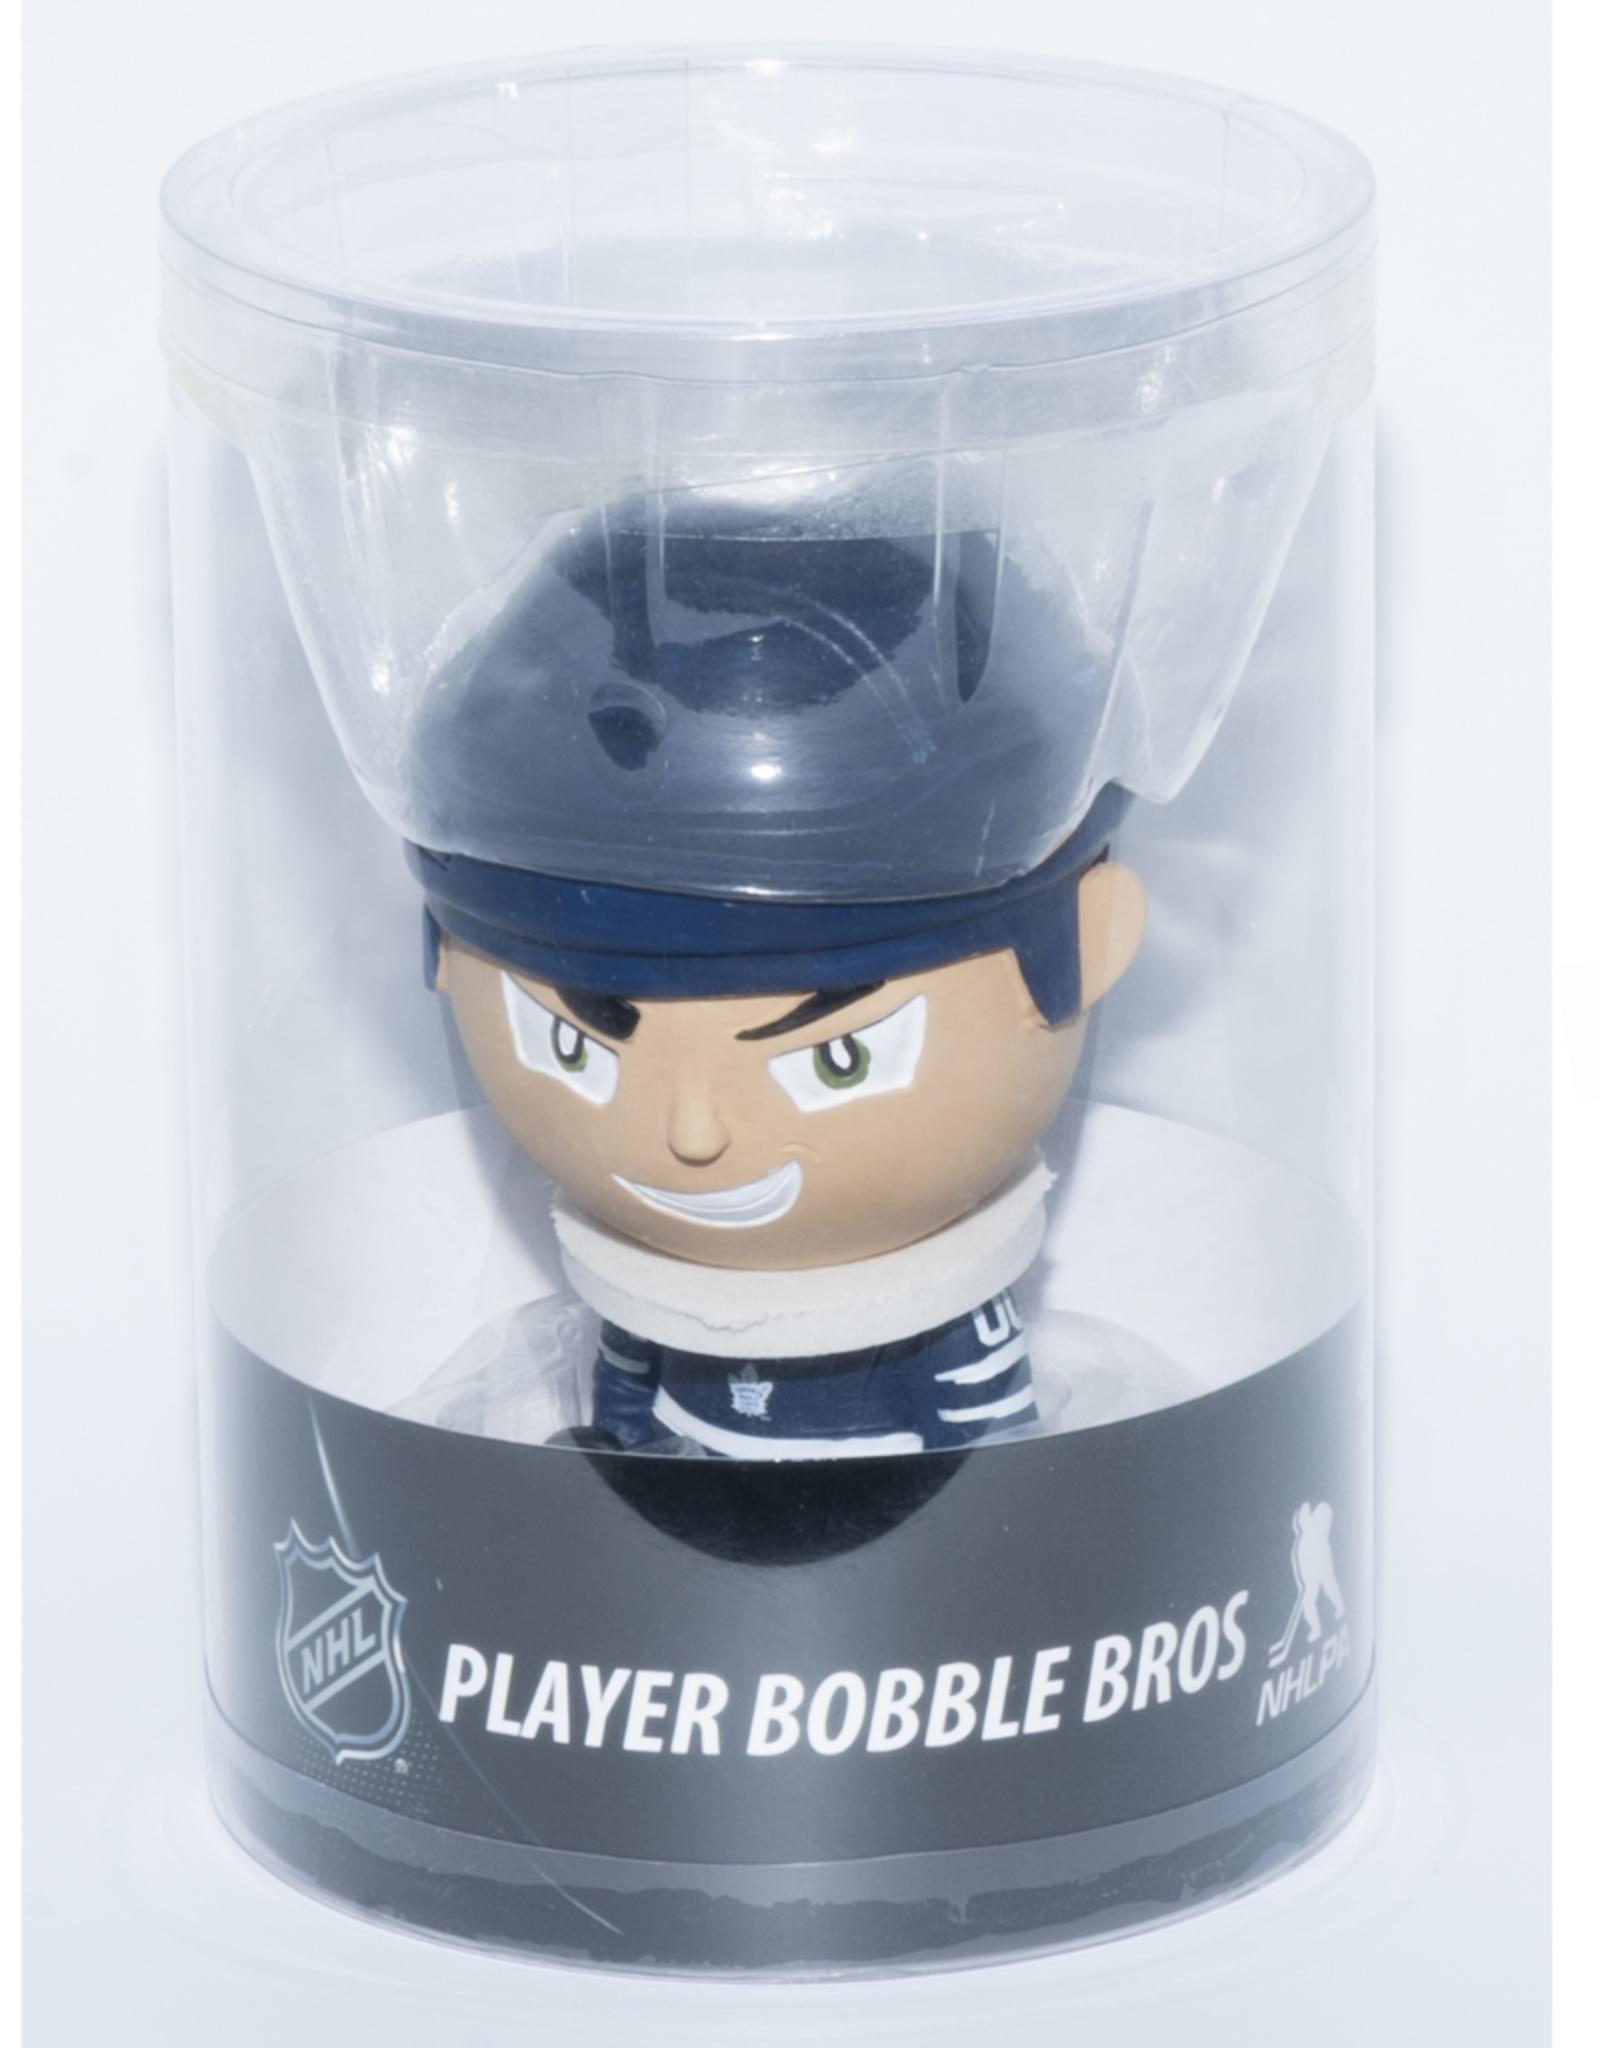 Forever Collectables FOCO Mini Baby Bro Bobble Head Toronto Maple leafs